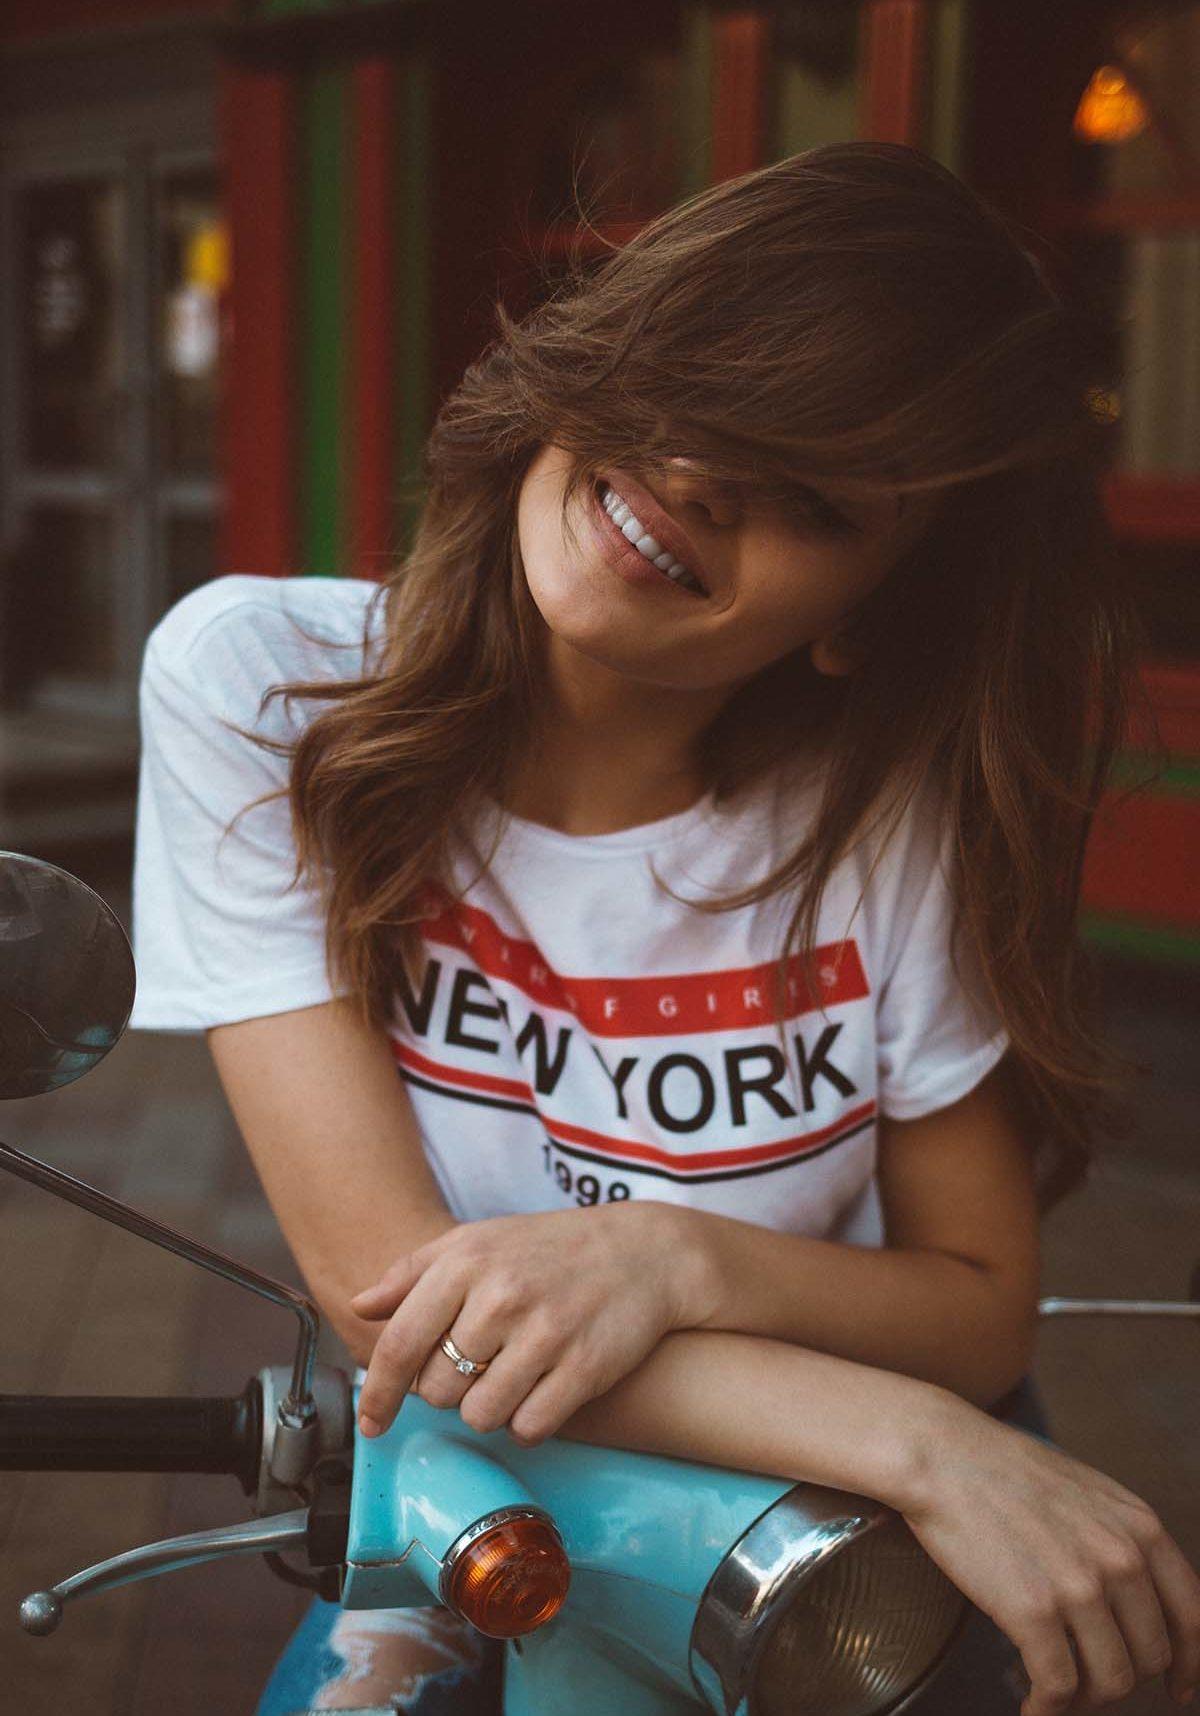 A beautiful girl New York